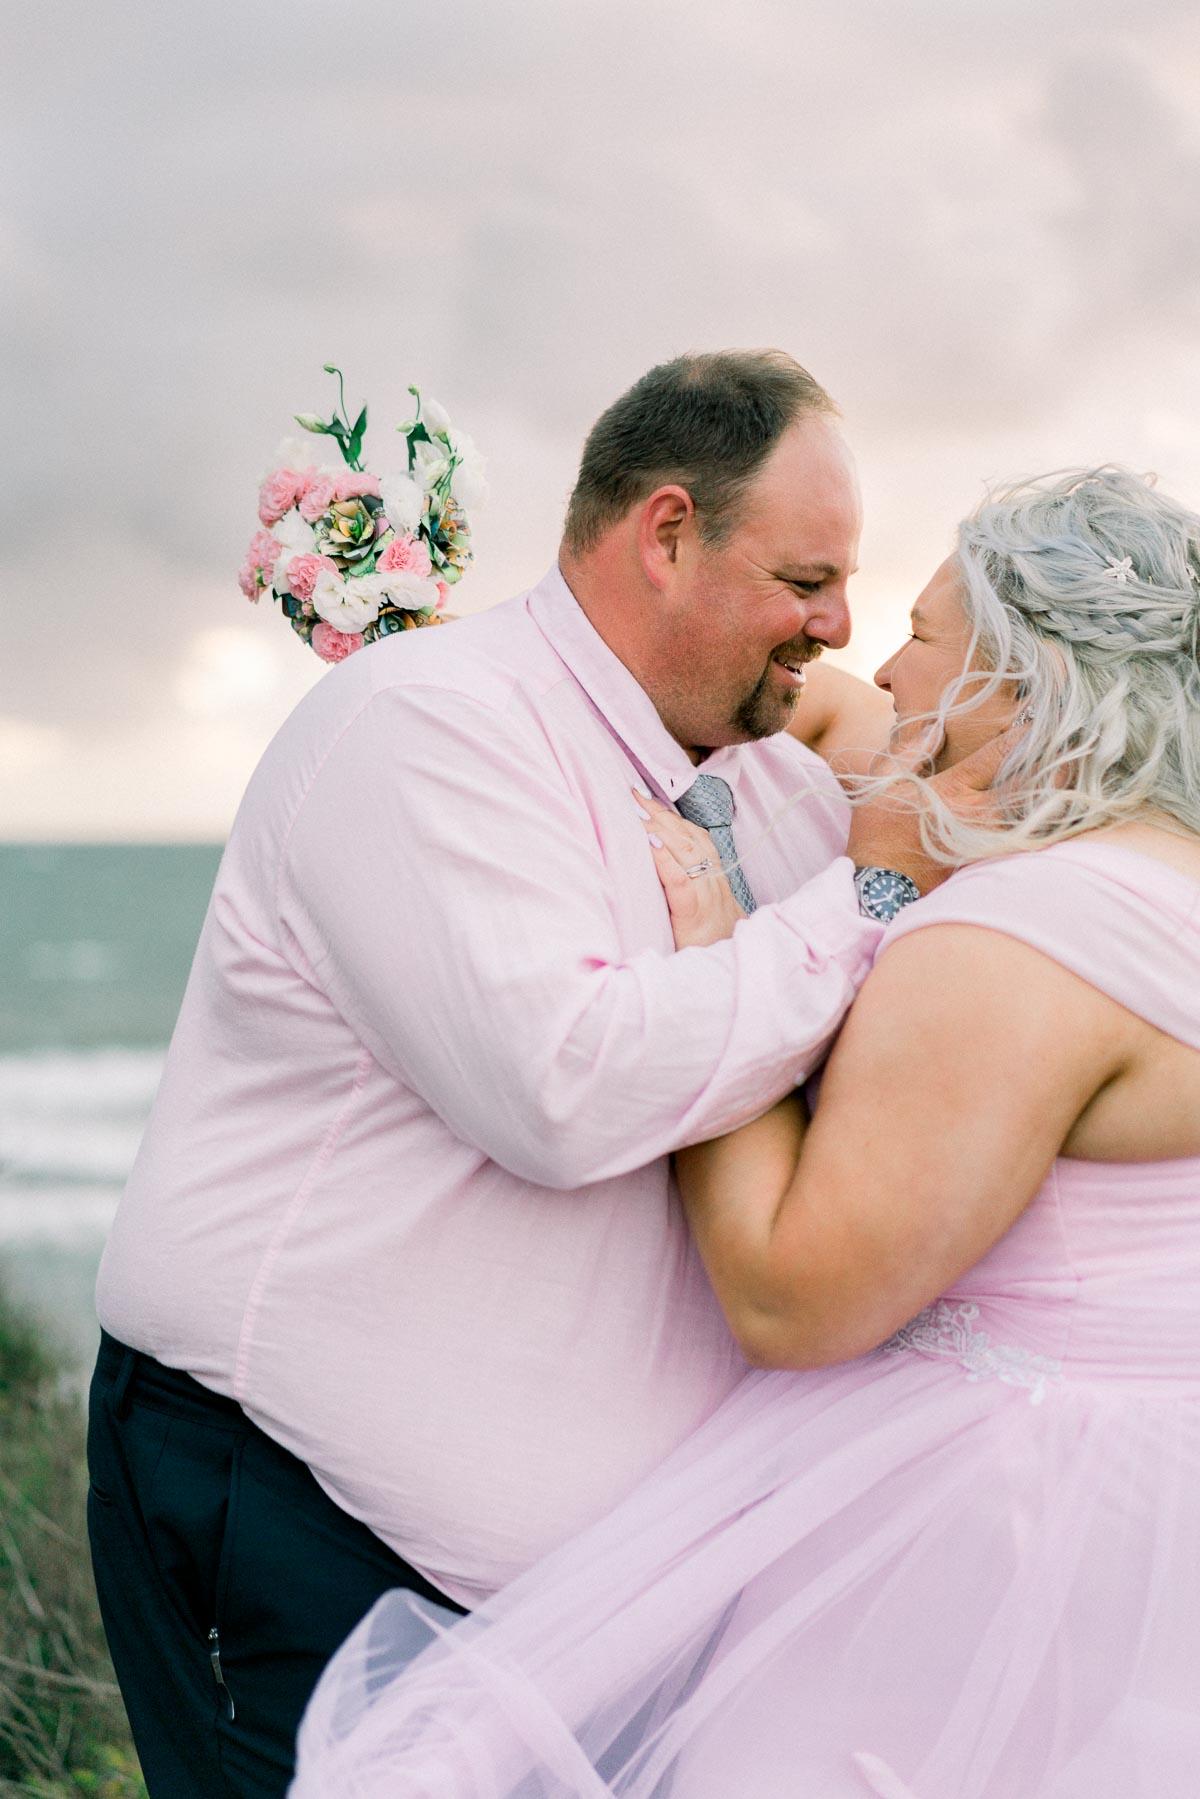 mt-eliza-mornington-peninsula-backyard-wedding-heart+soul-weddings-allison-matt-04131.jpg